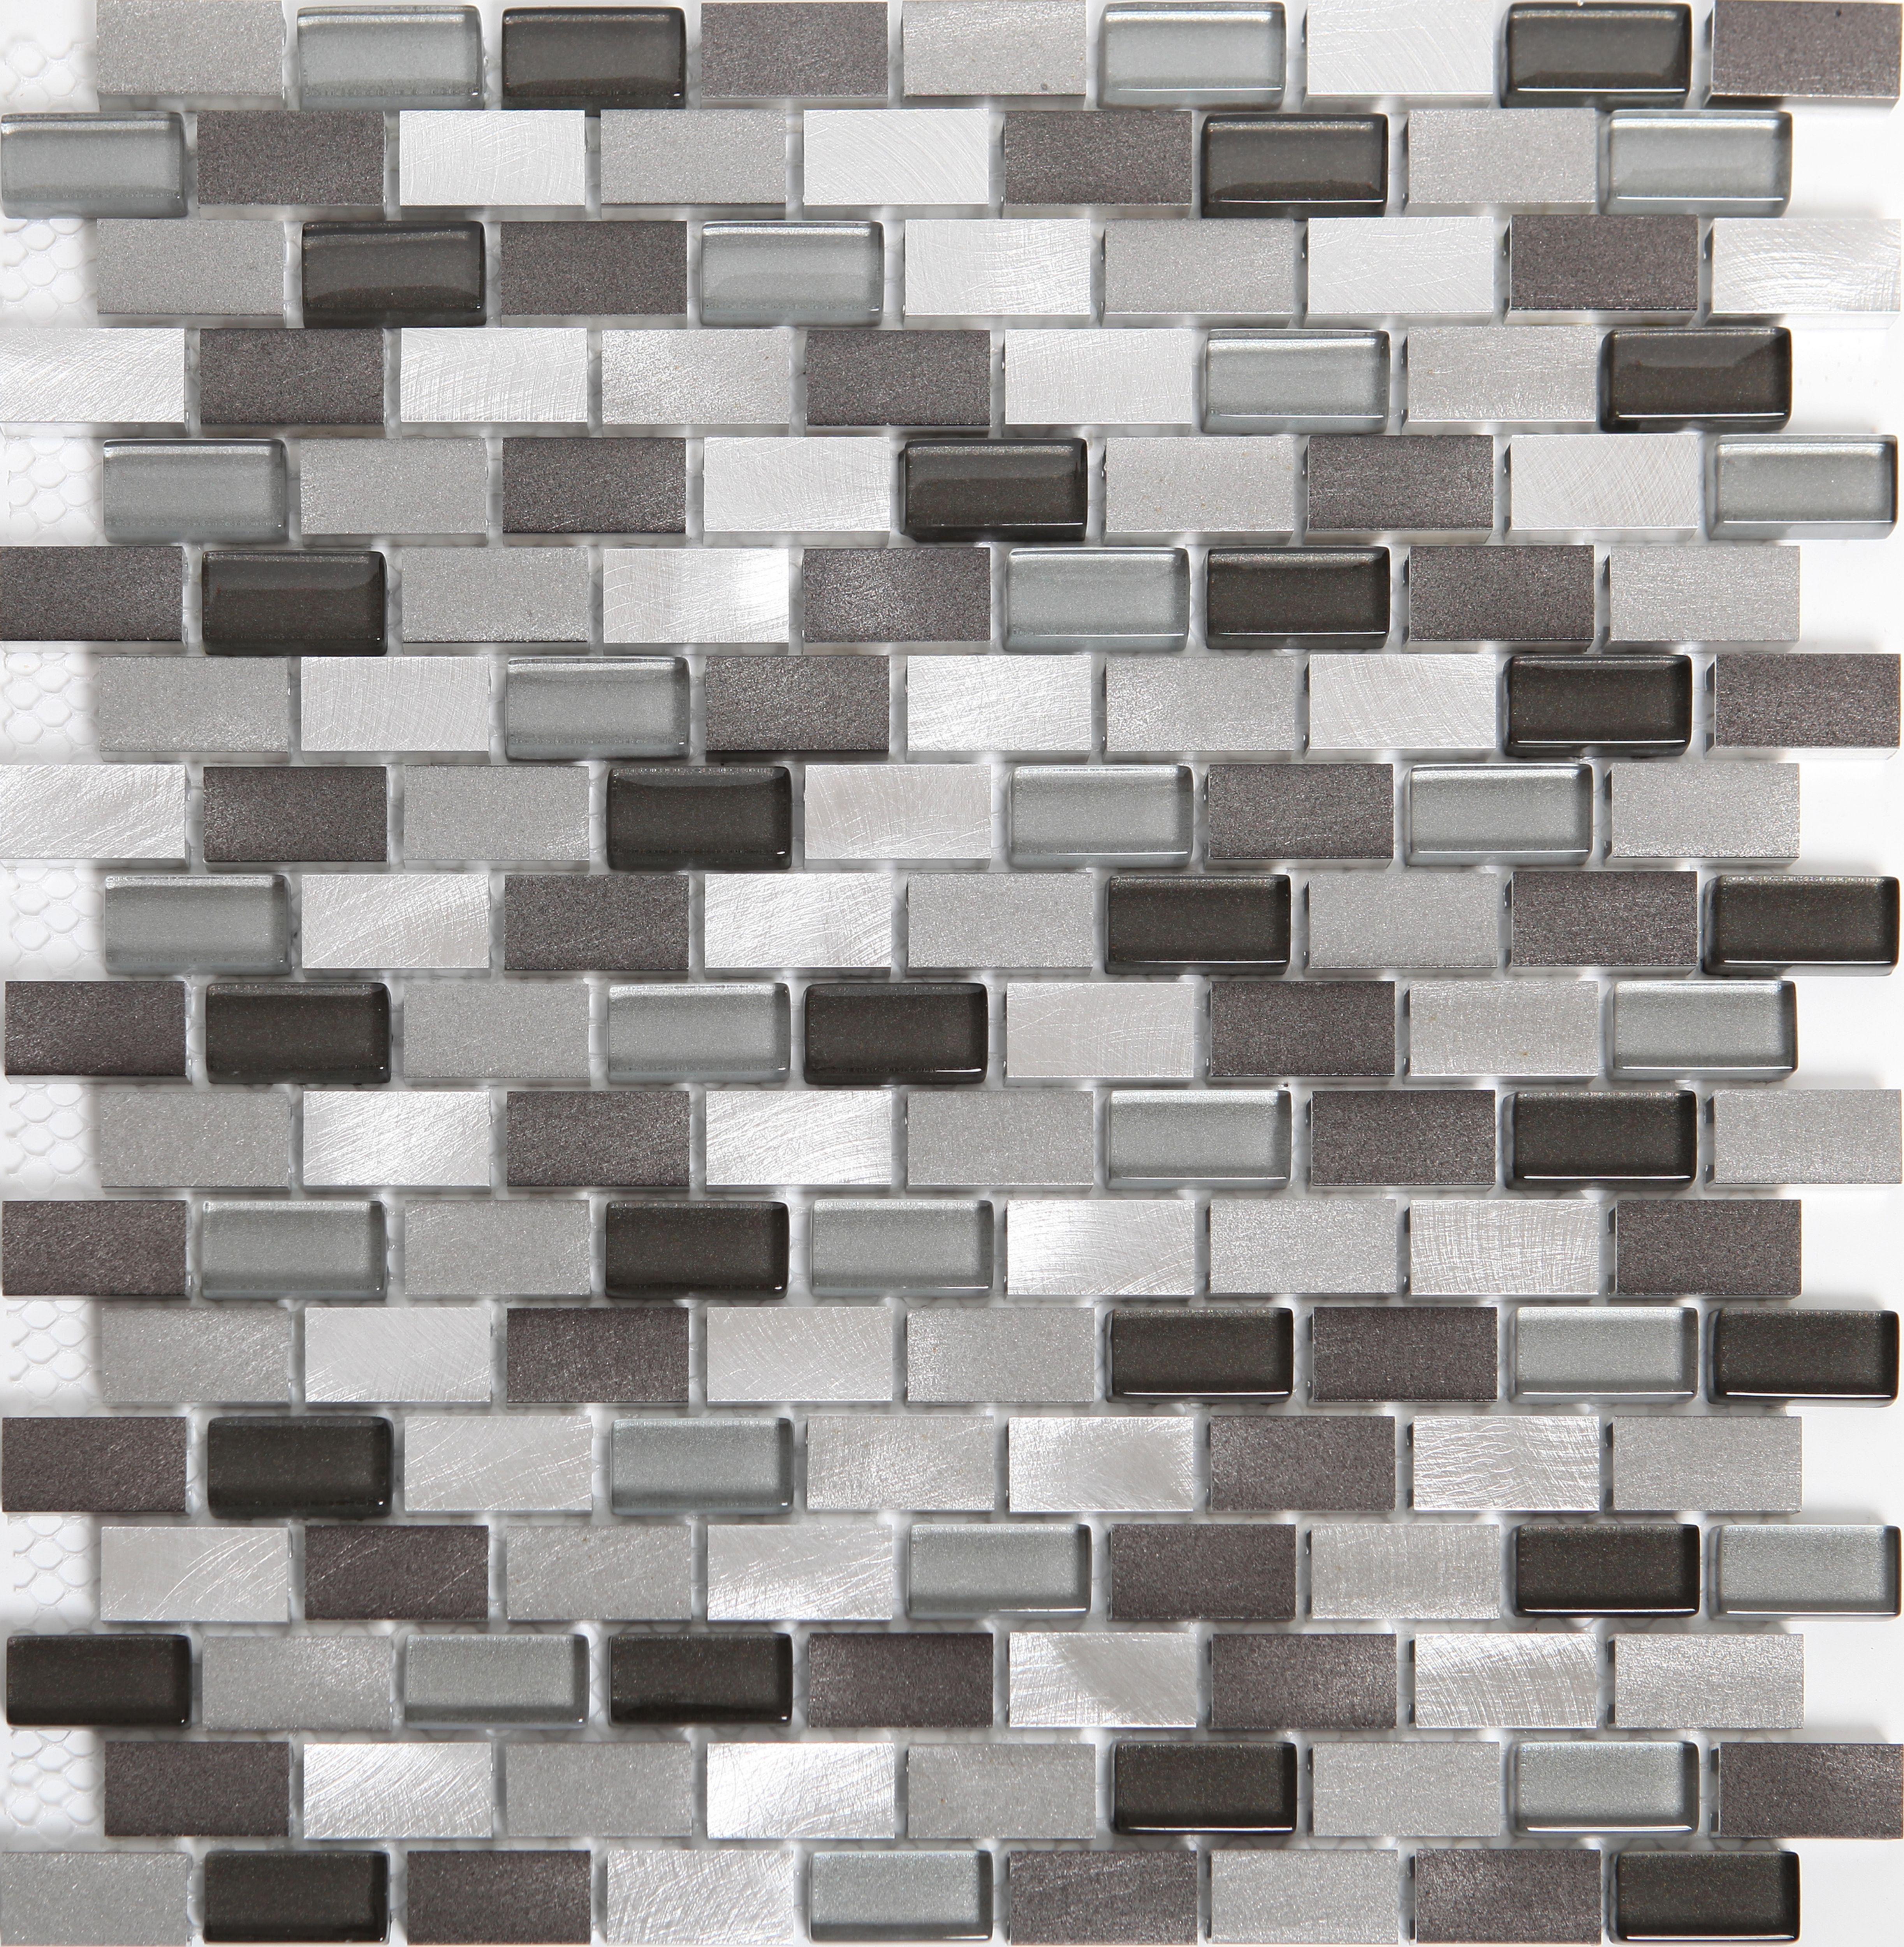 carini grey aluminum mosaic tile l 304mm w 292mm. Black Bedroom Furniture Sets. Home Design Ideas